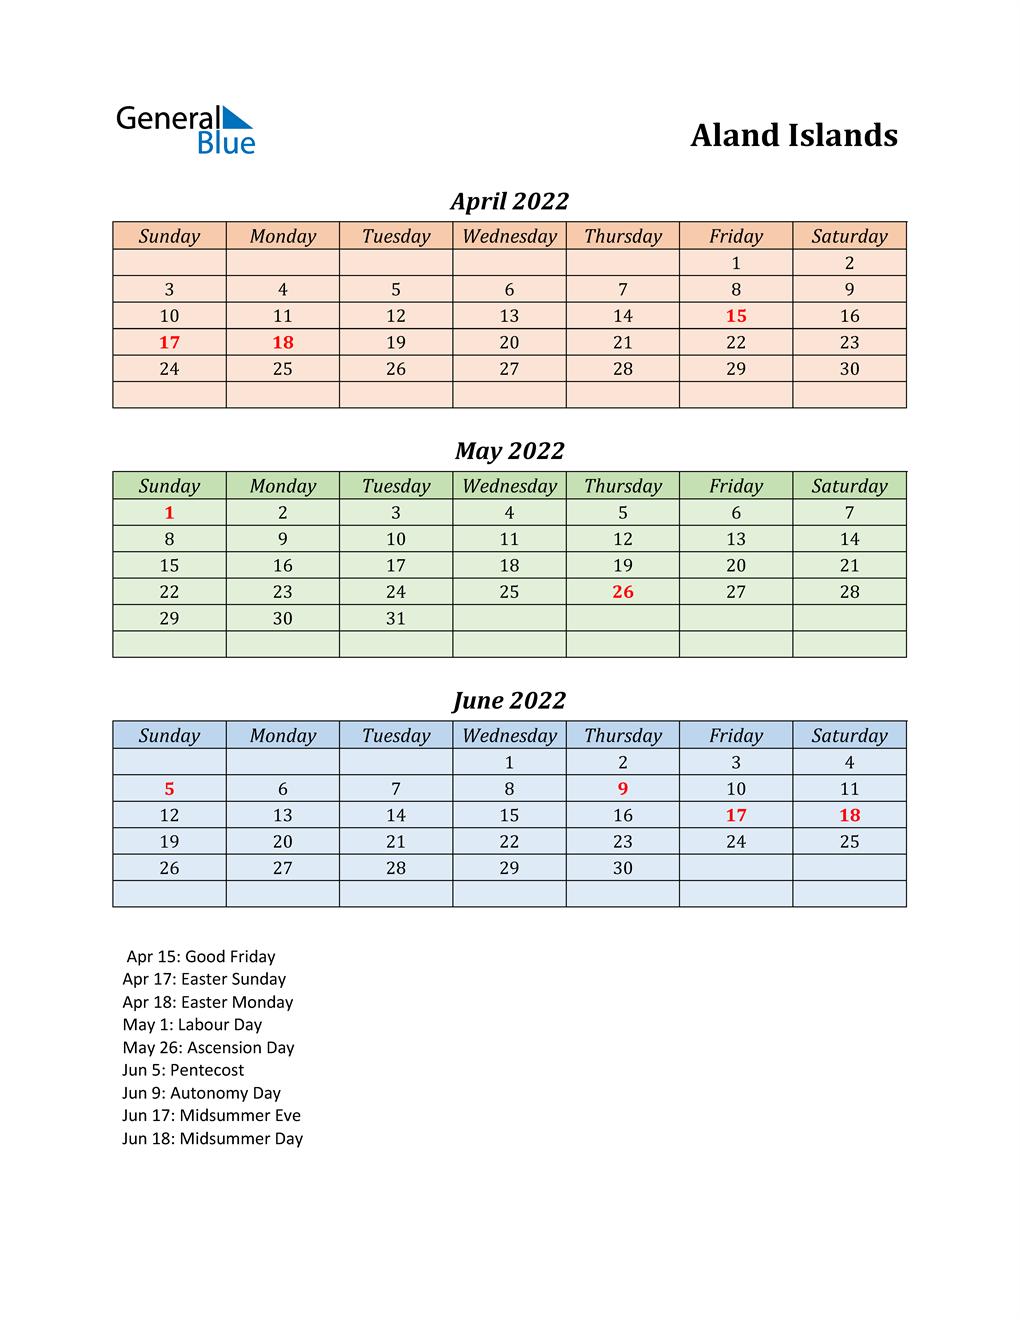 Q2 2022 Holiday Calendar - Aland Islands